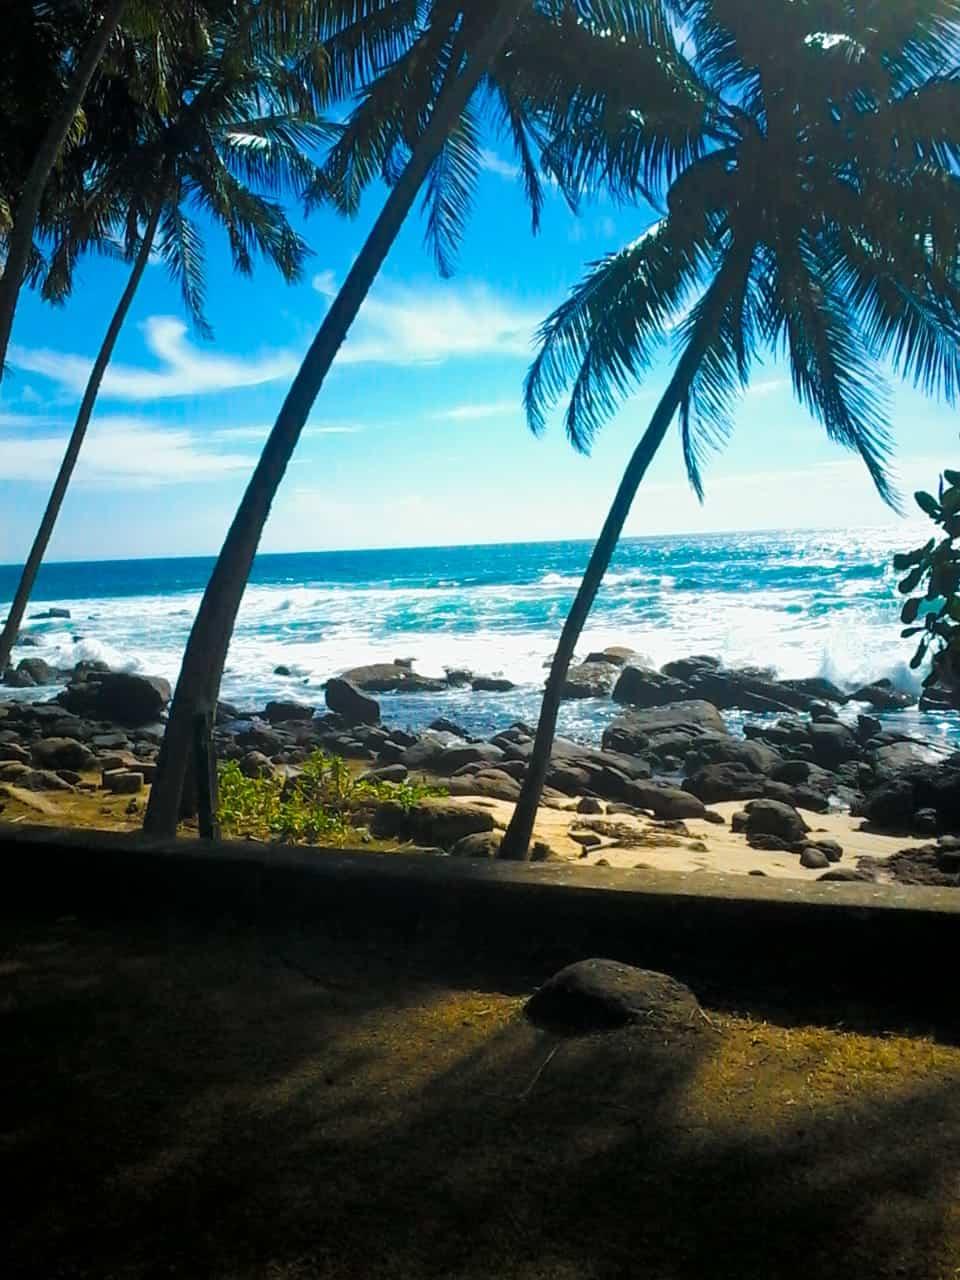 dondra-wowtovisit-dewundara,srilanka